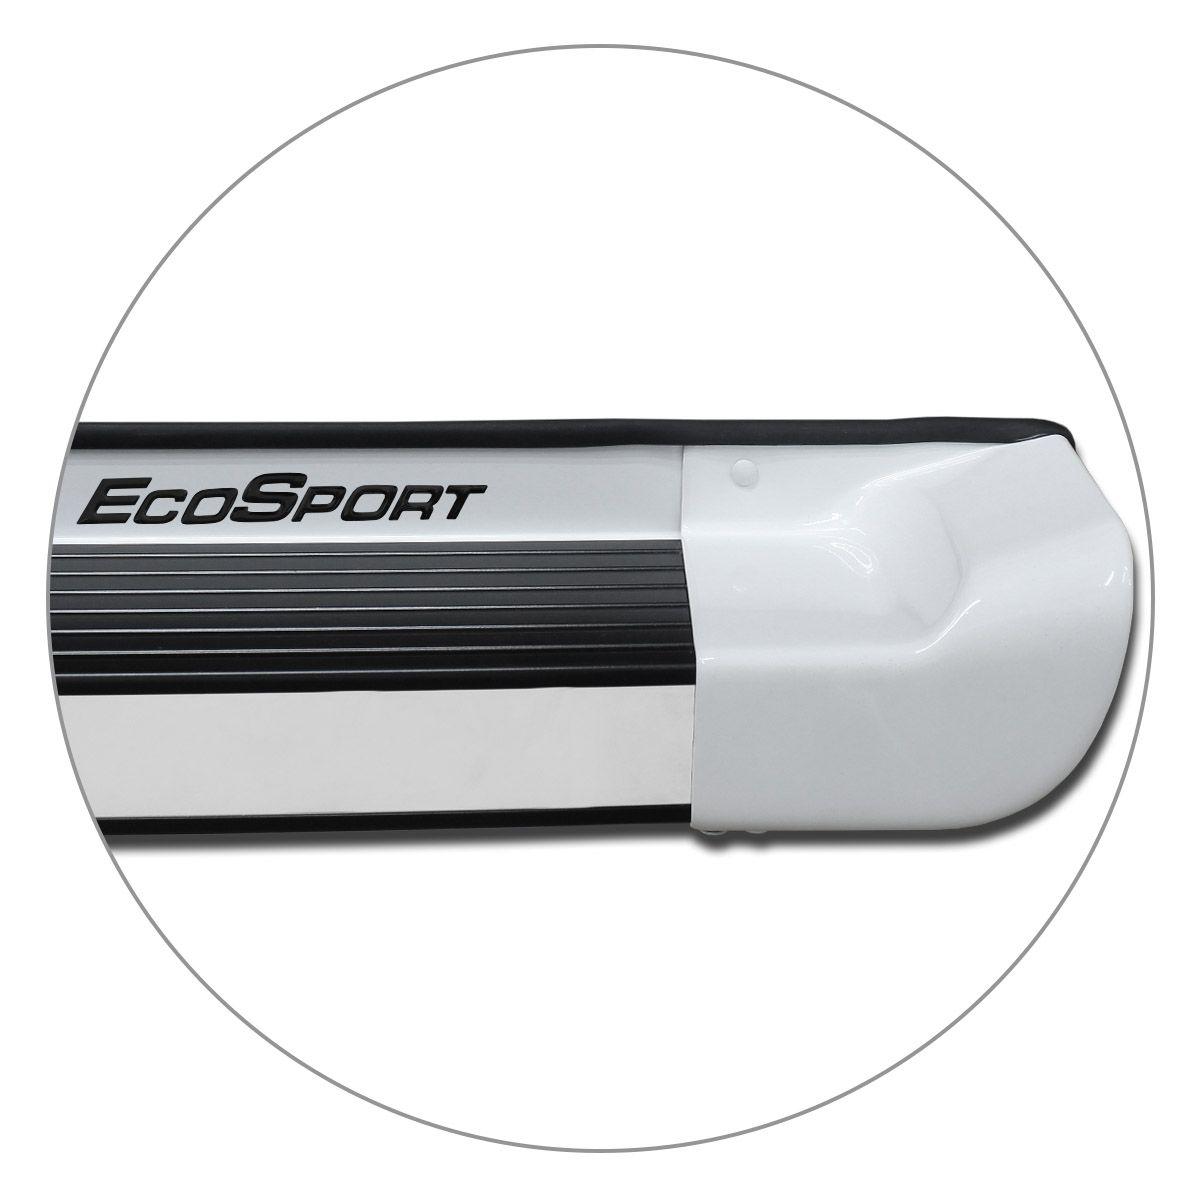 Estribo Lateral Ecosport 2013 a 2019 Branco Artico Personalizado